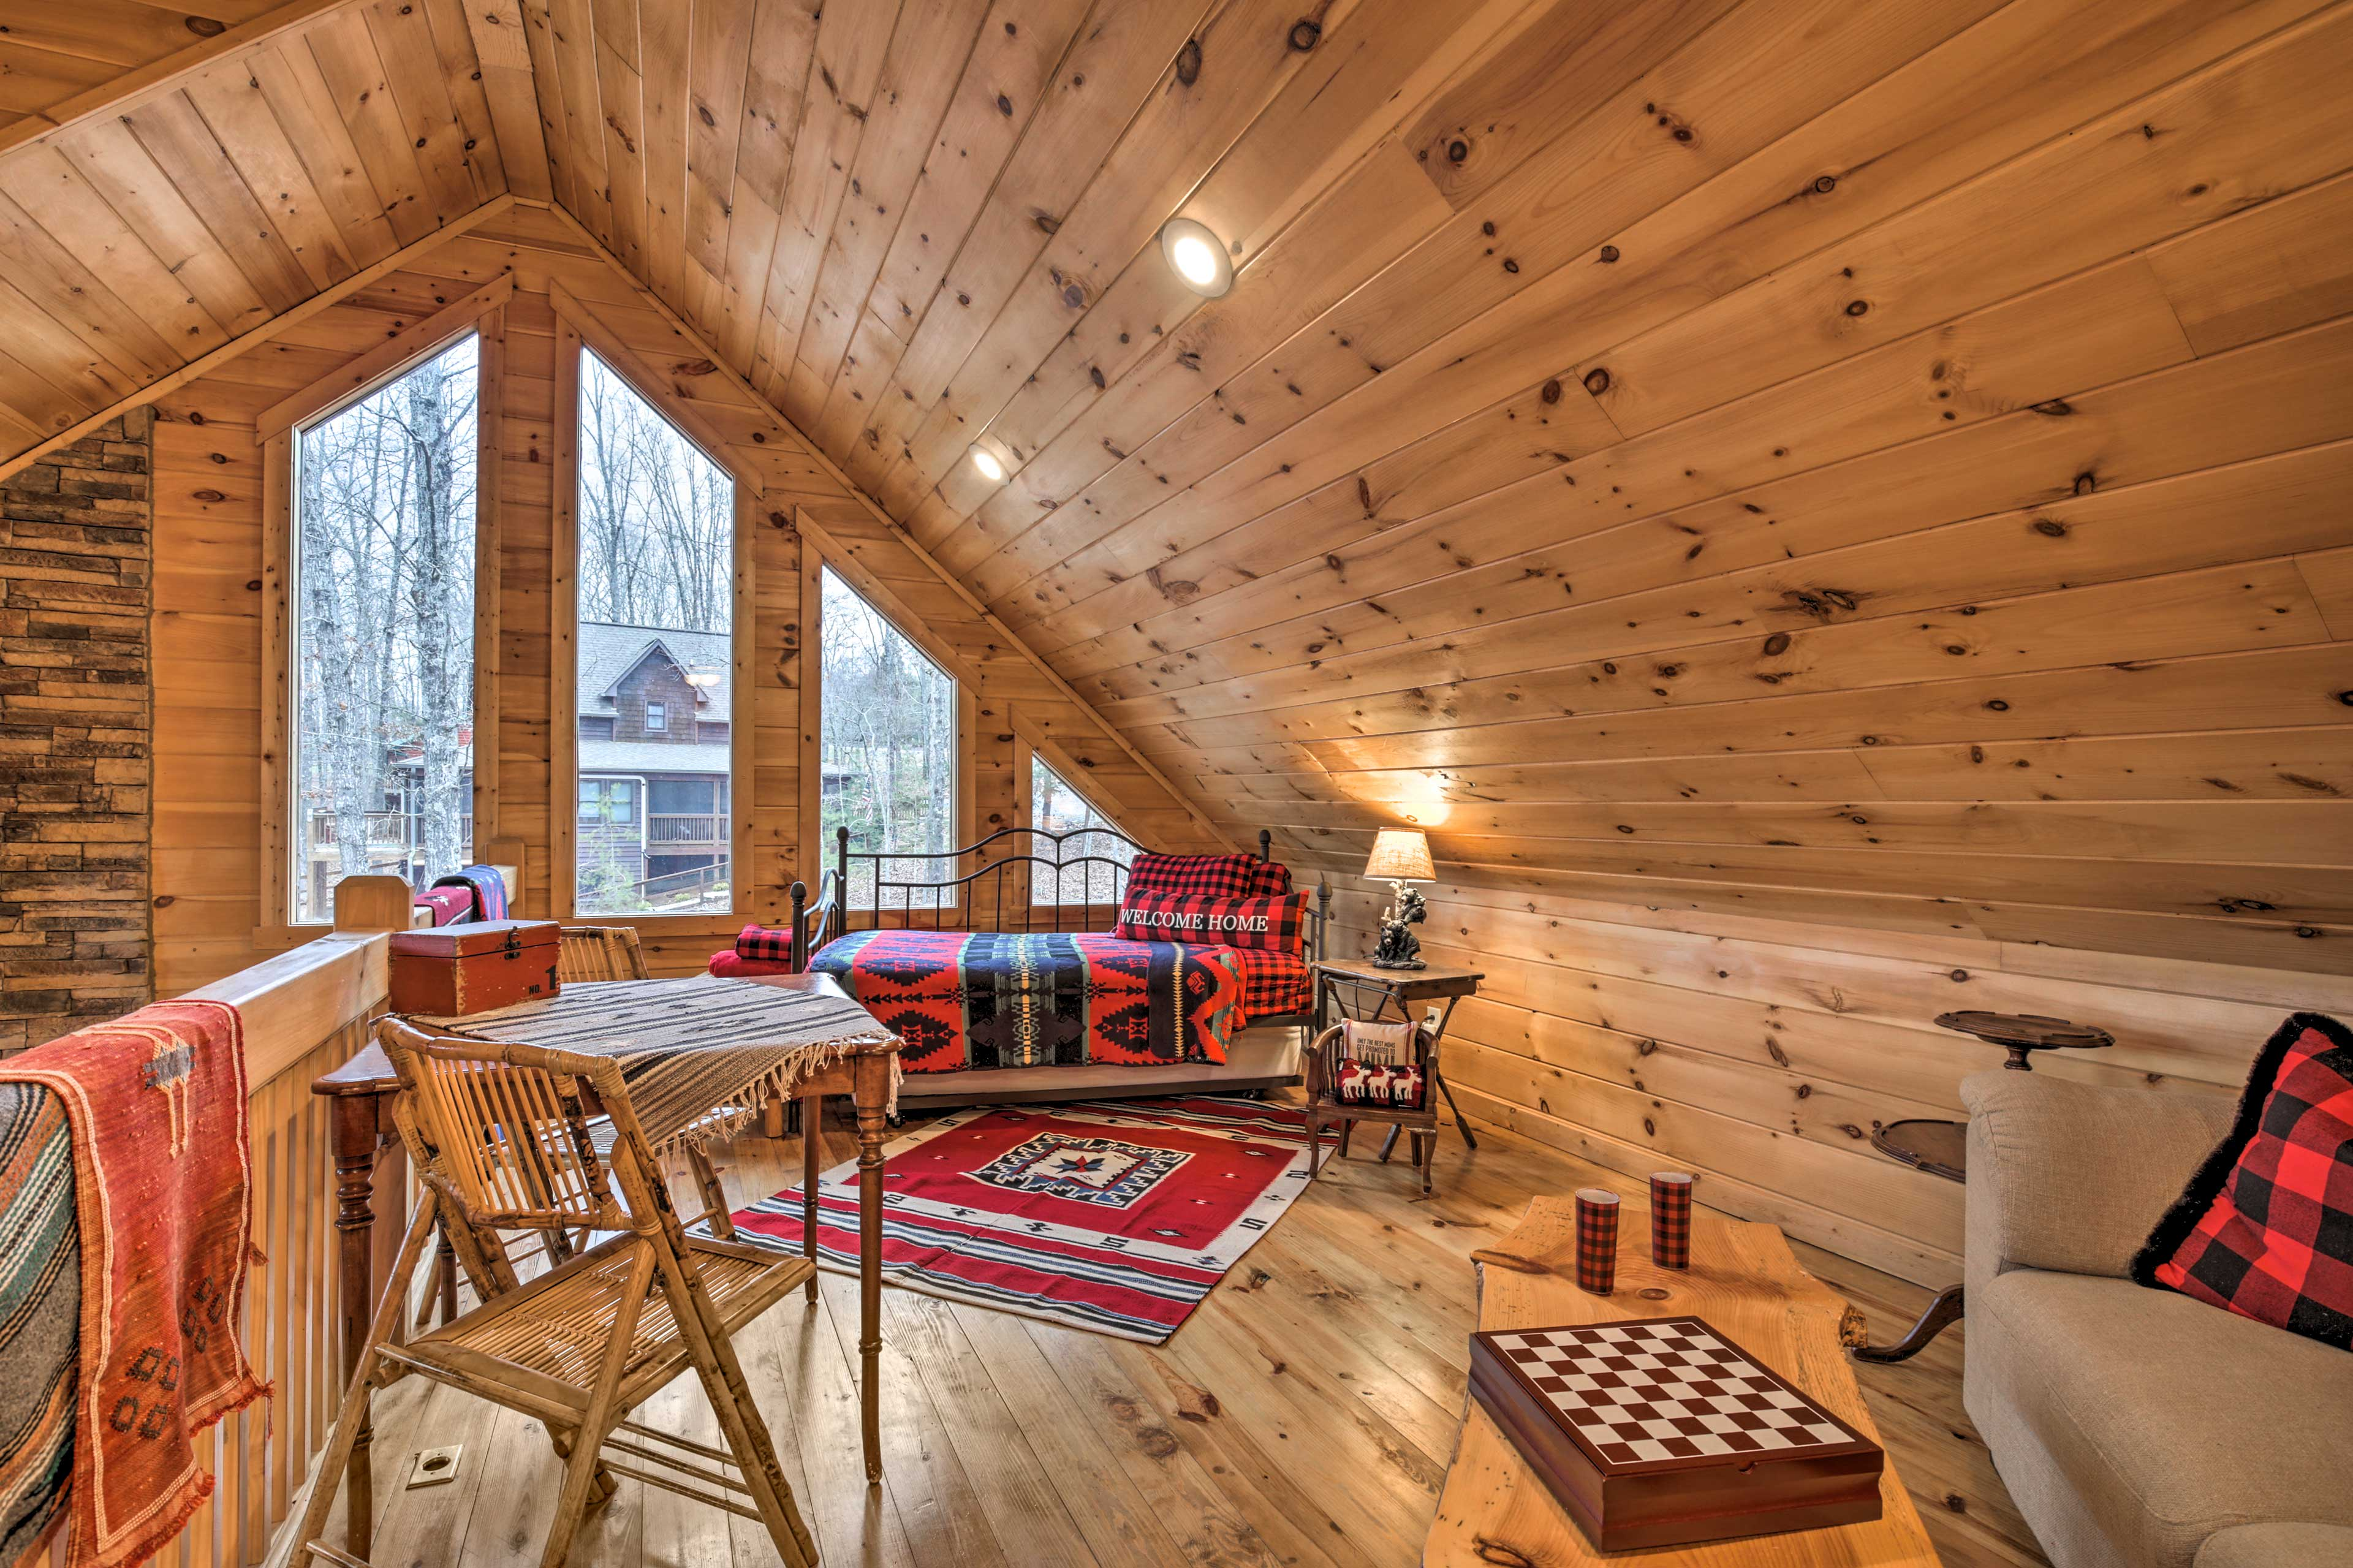 Loft | Additional Sleeping Space